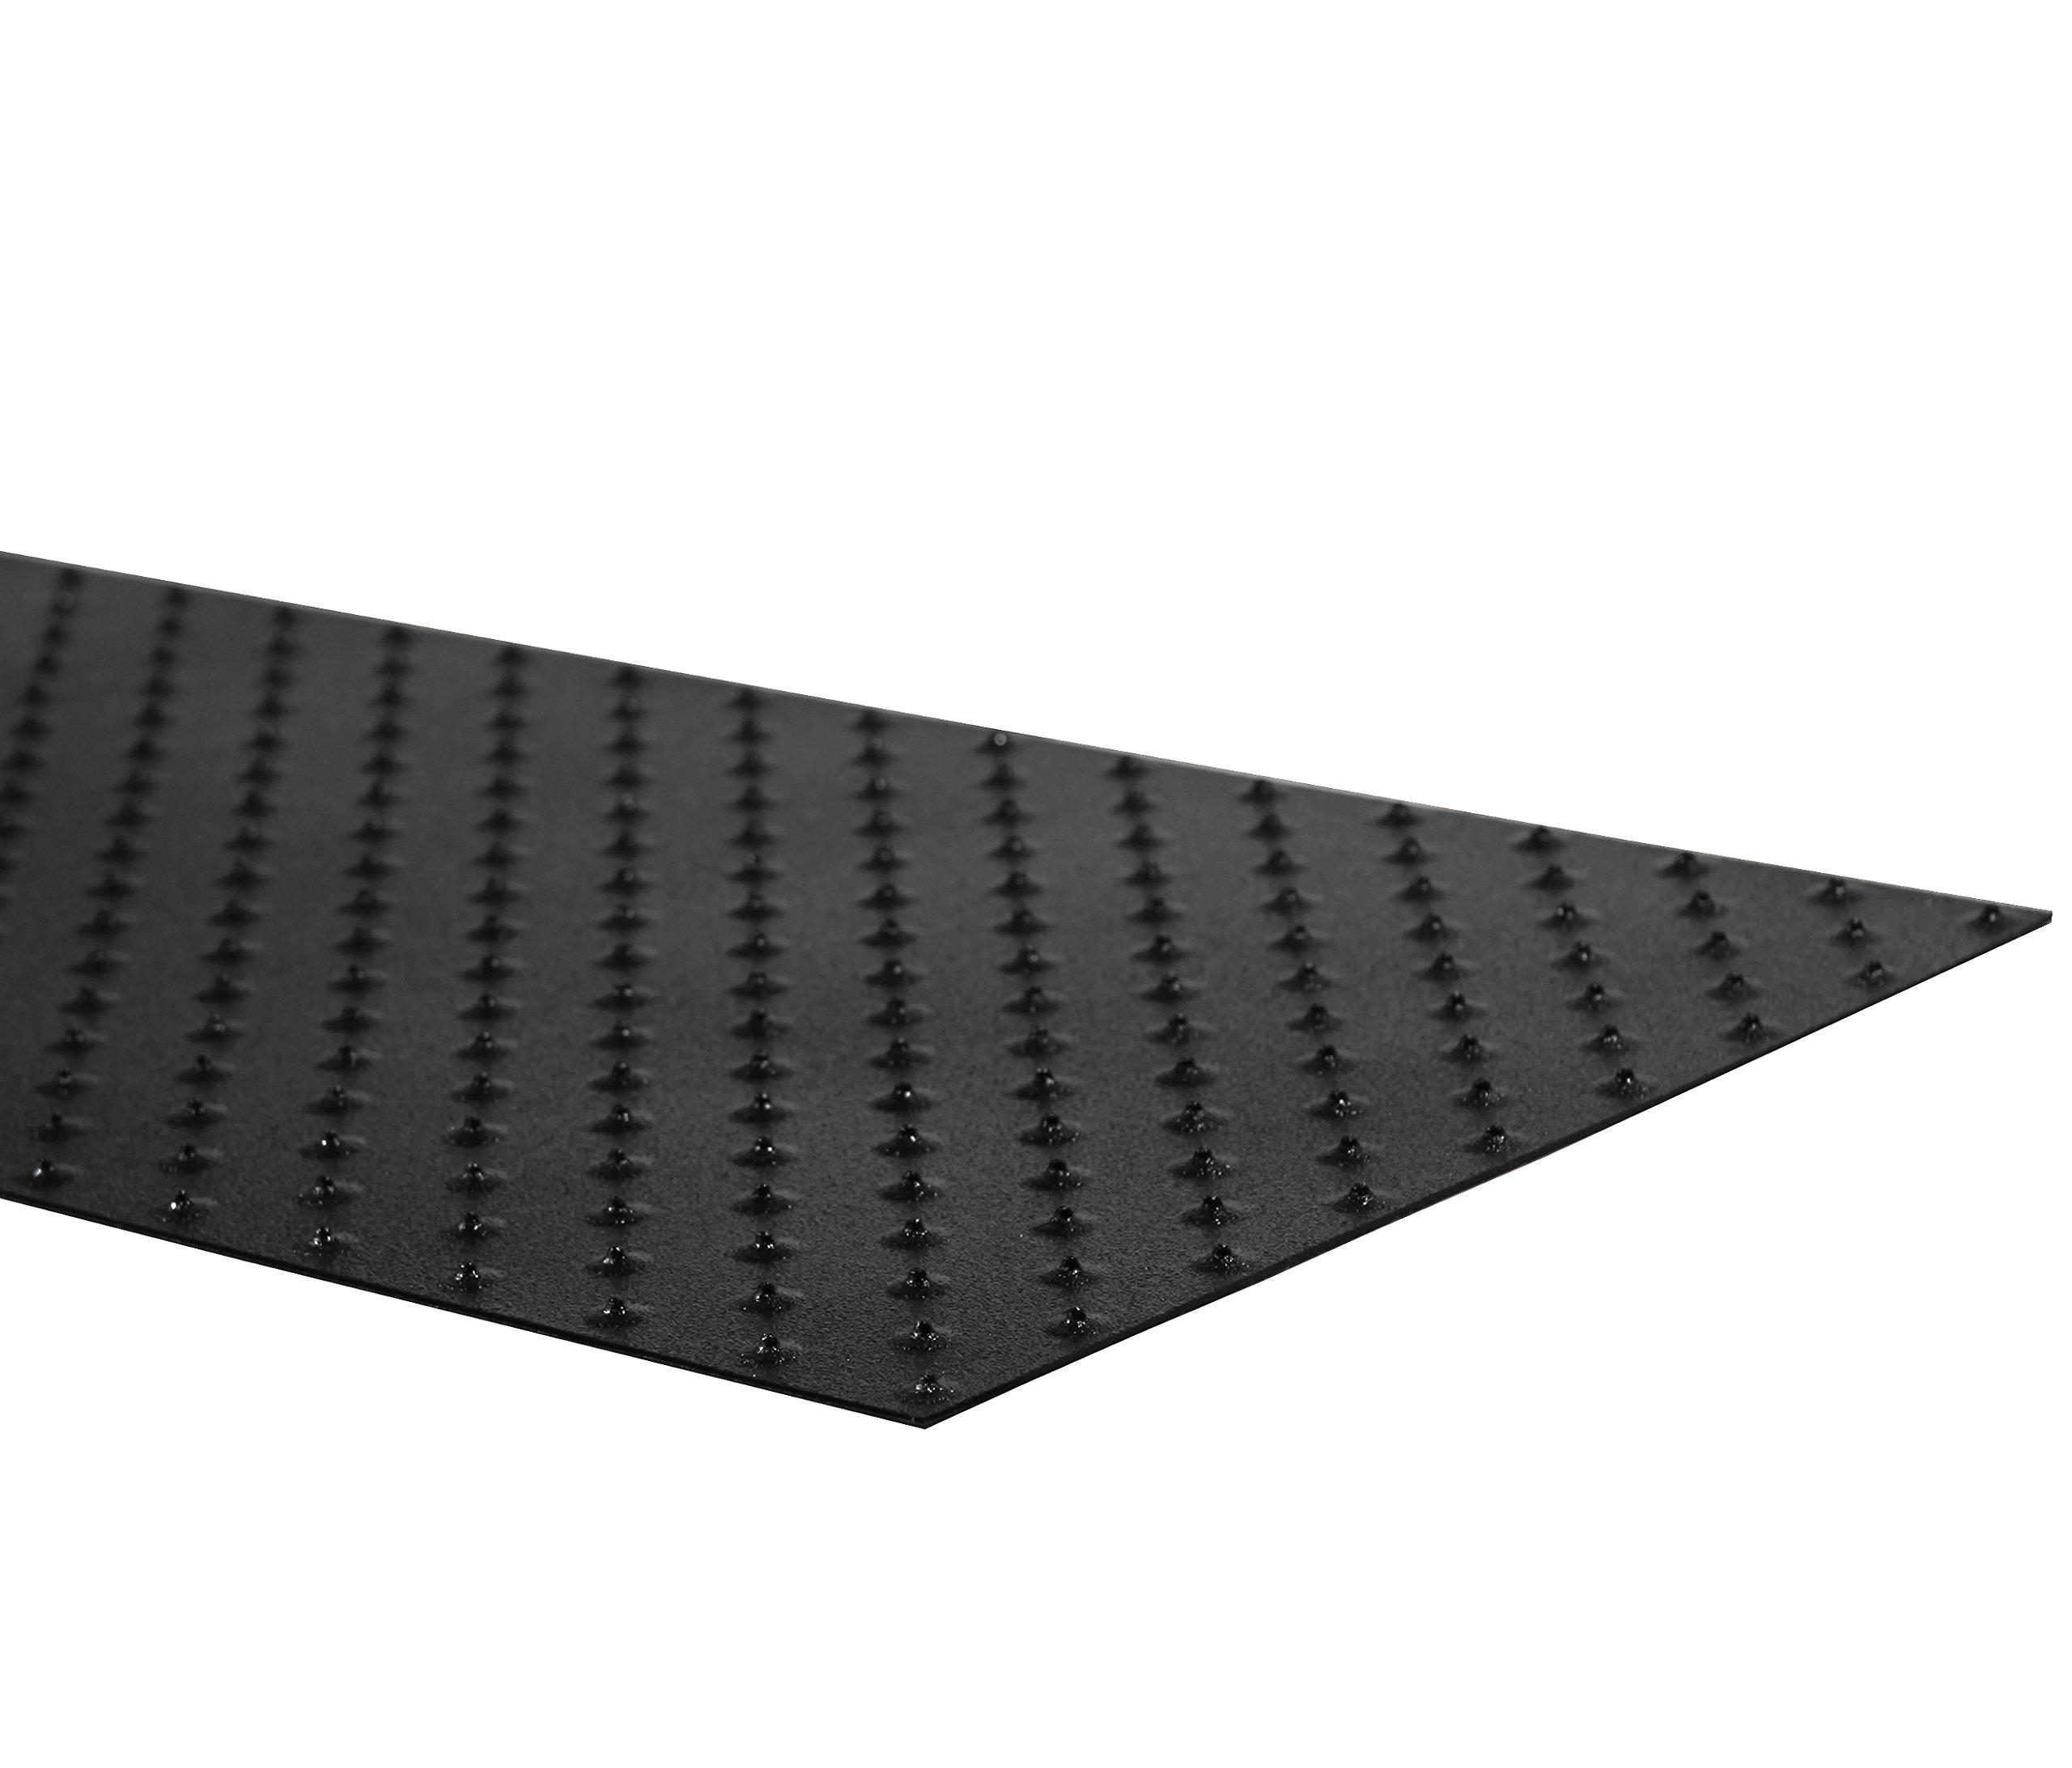 XtremeGrip by GripAll. Black studded anti-slip product.  12'' x 24''